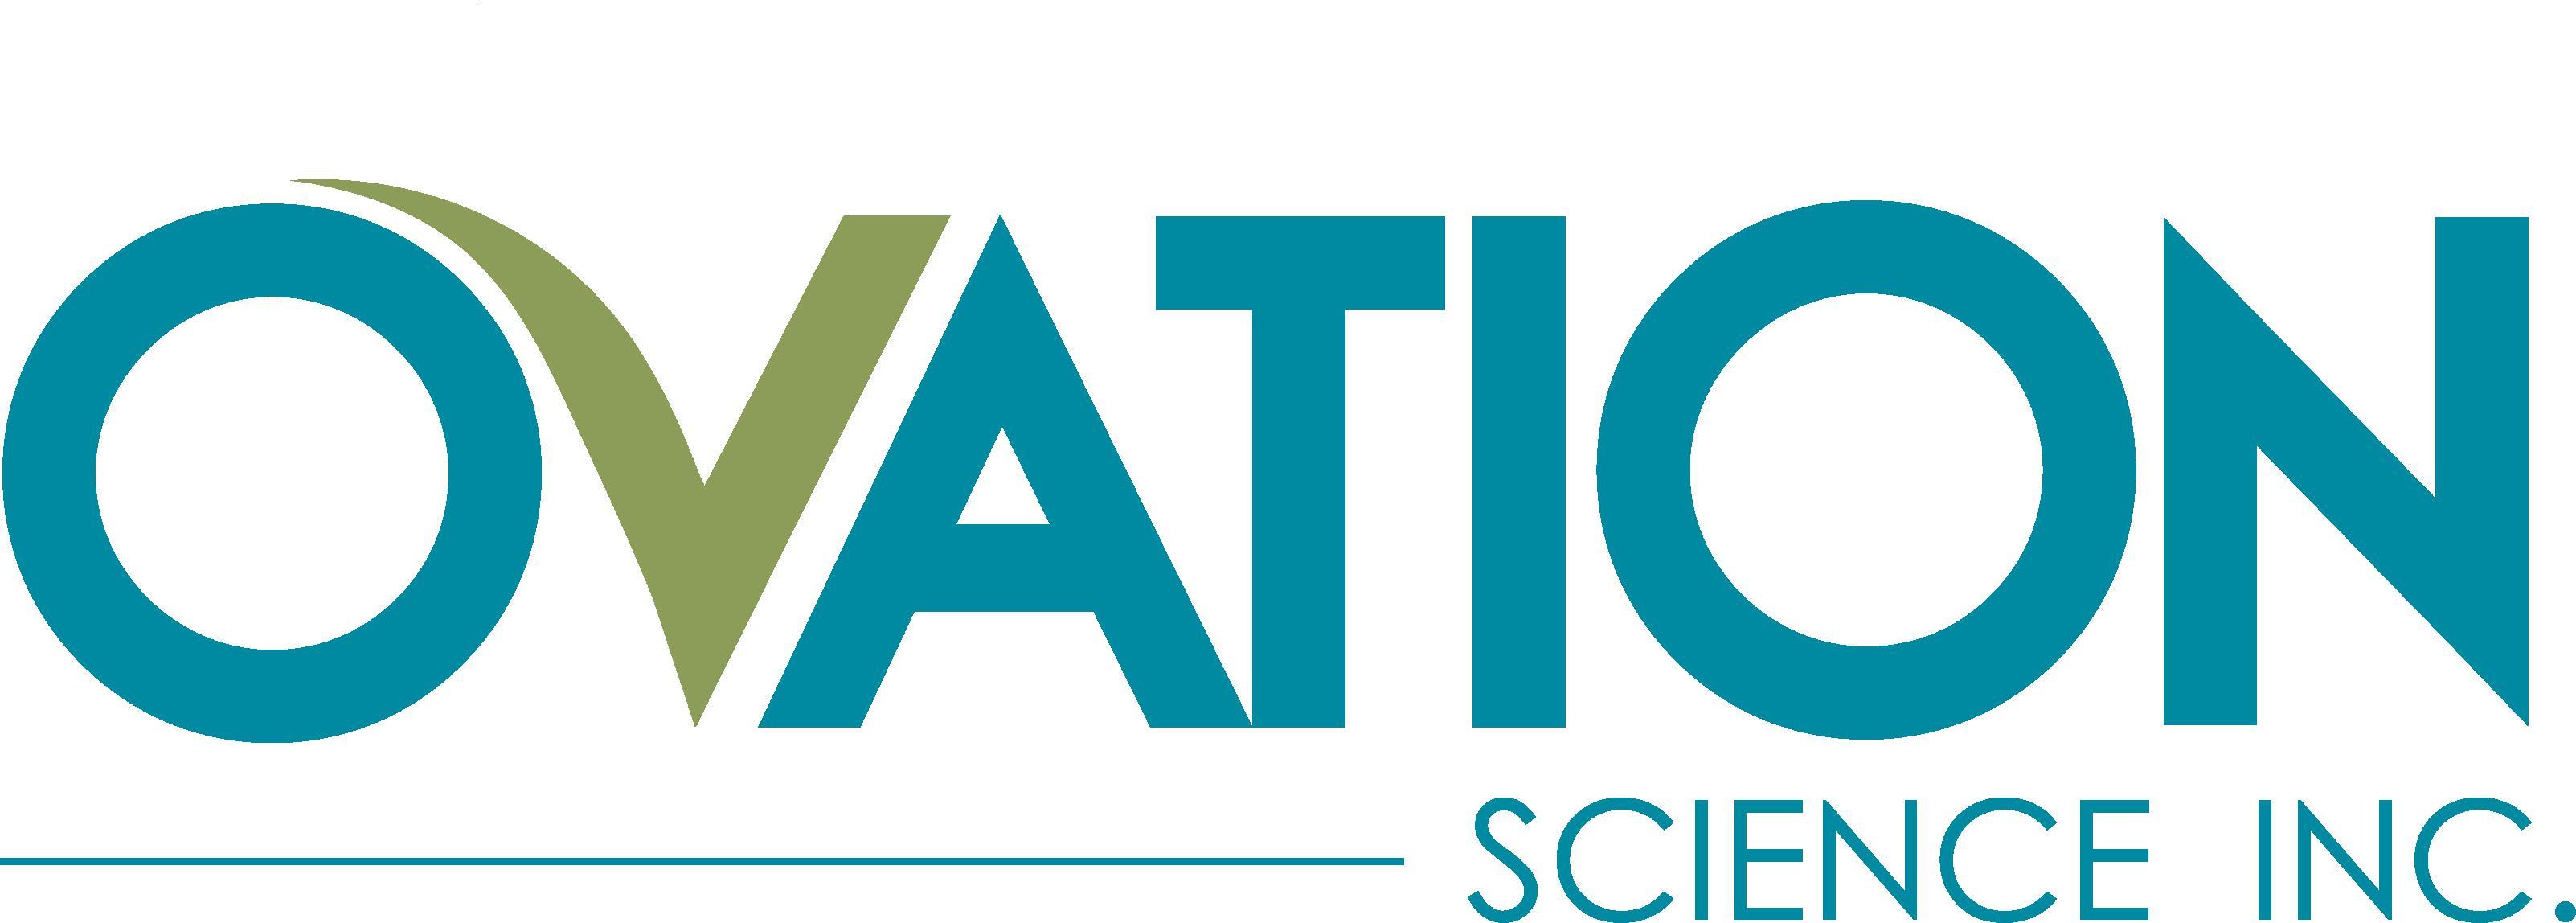 Ovation Science Inc.